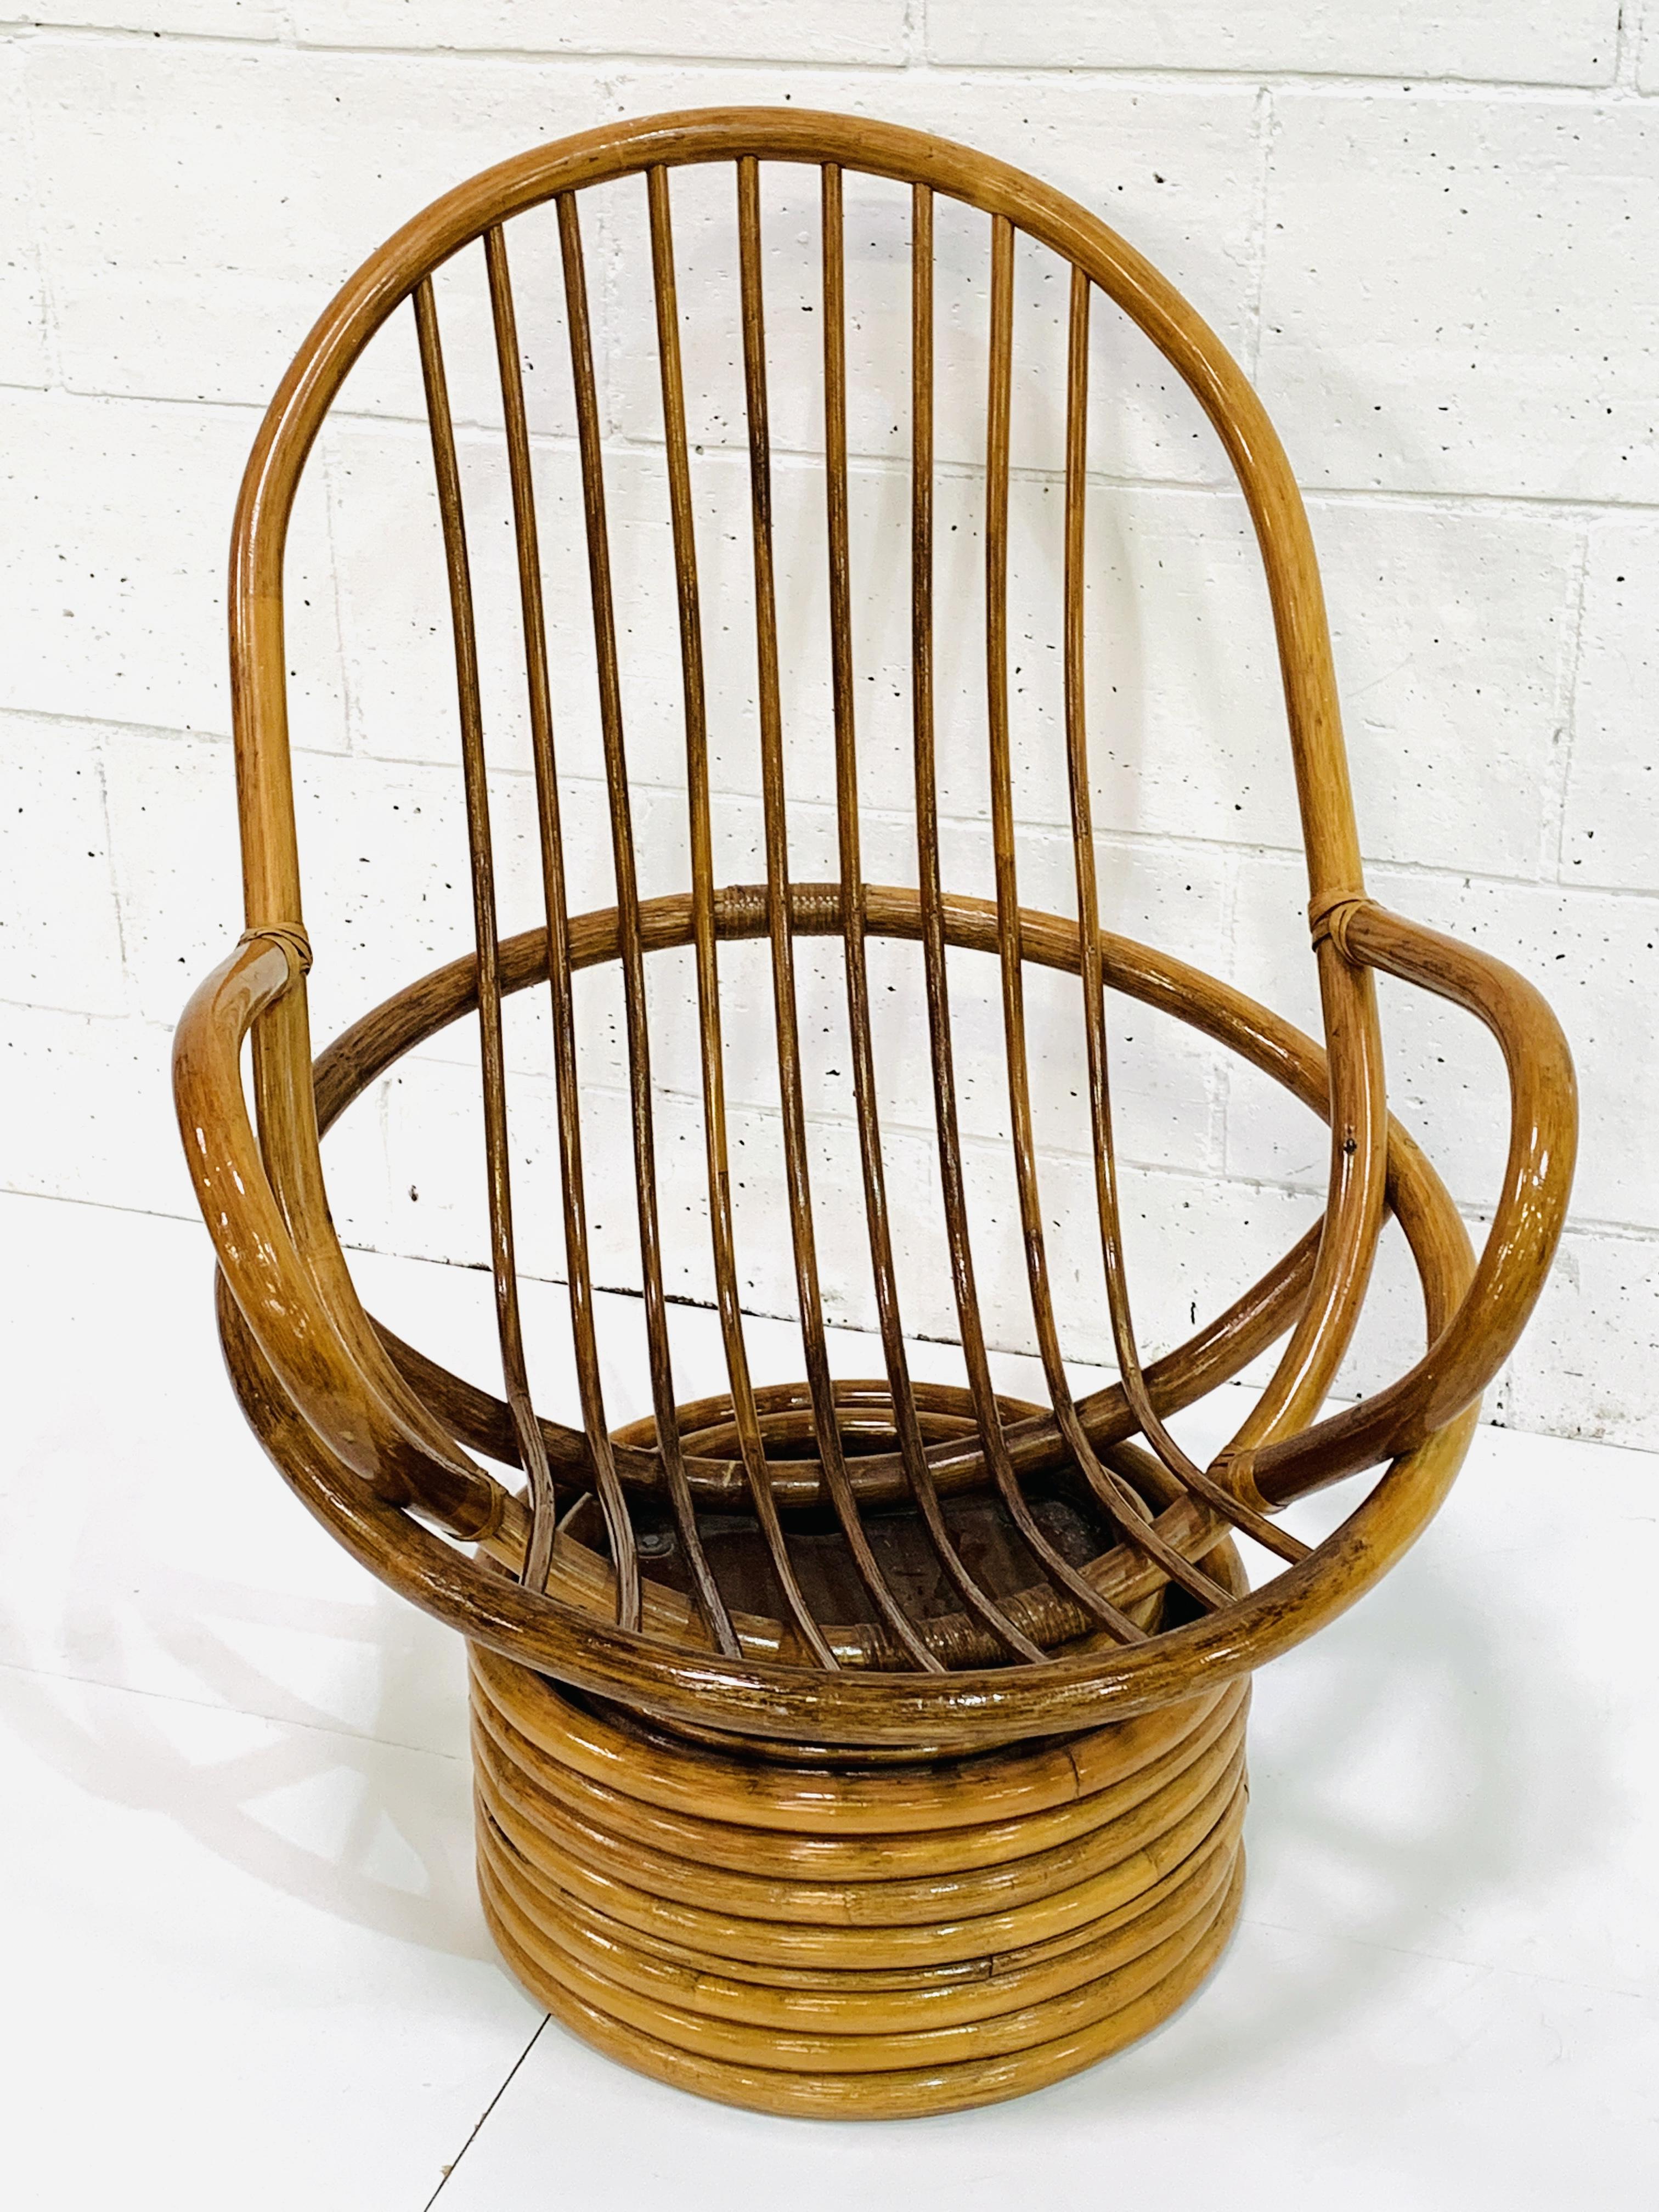 Cane swivel tub armchair - Image 3 of 3